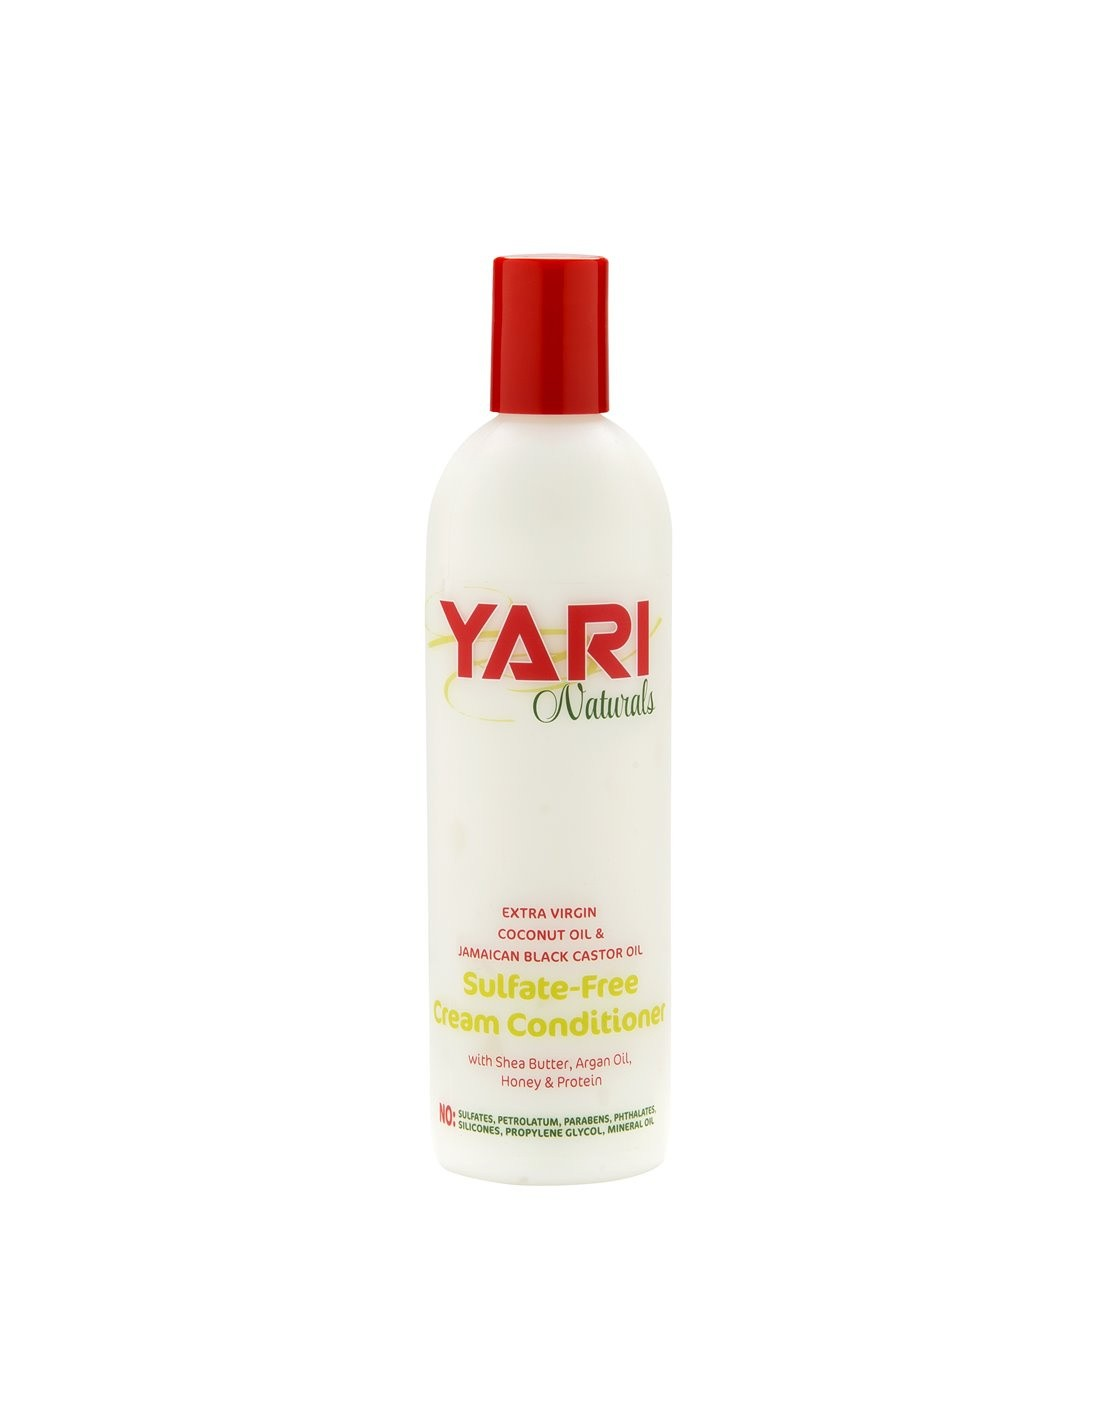 YARI Naturals Sulfate-Free Cream Conditioner